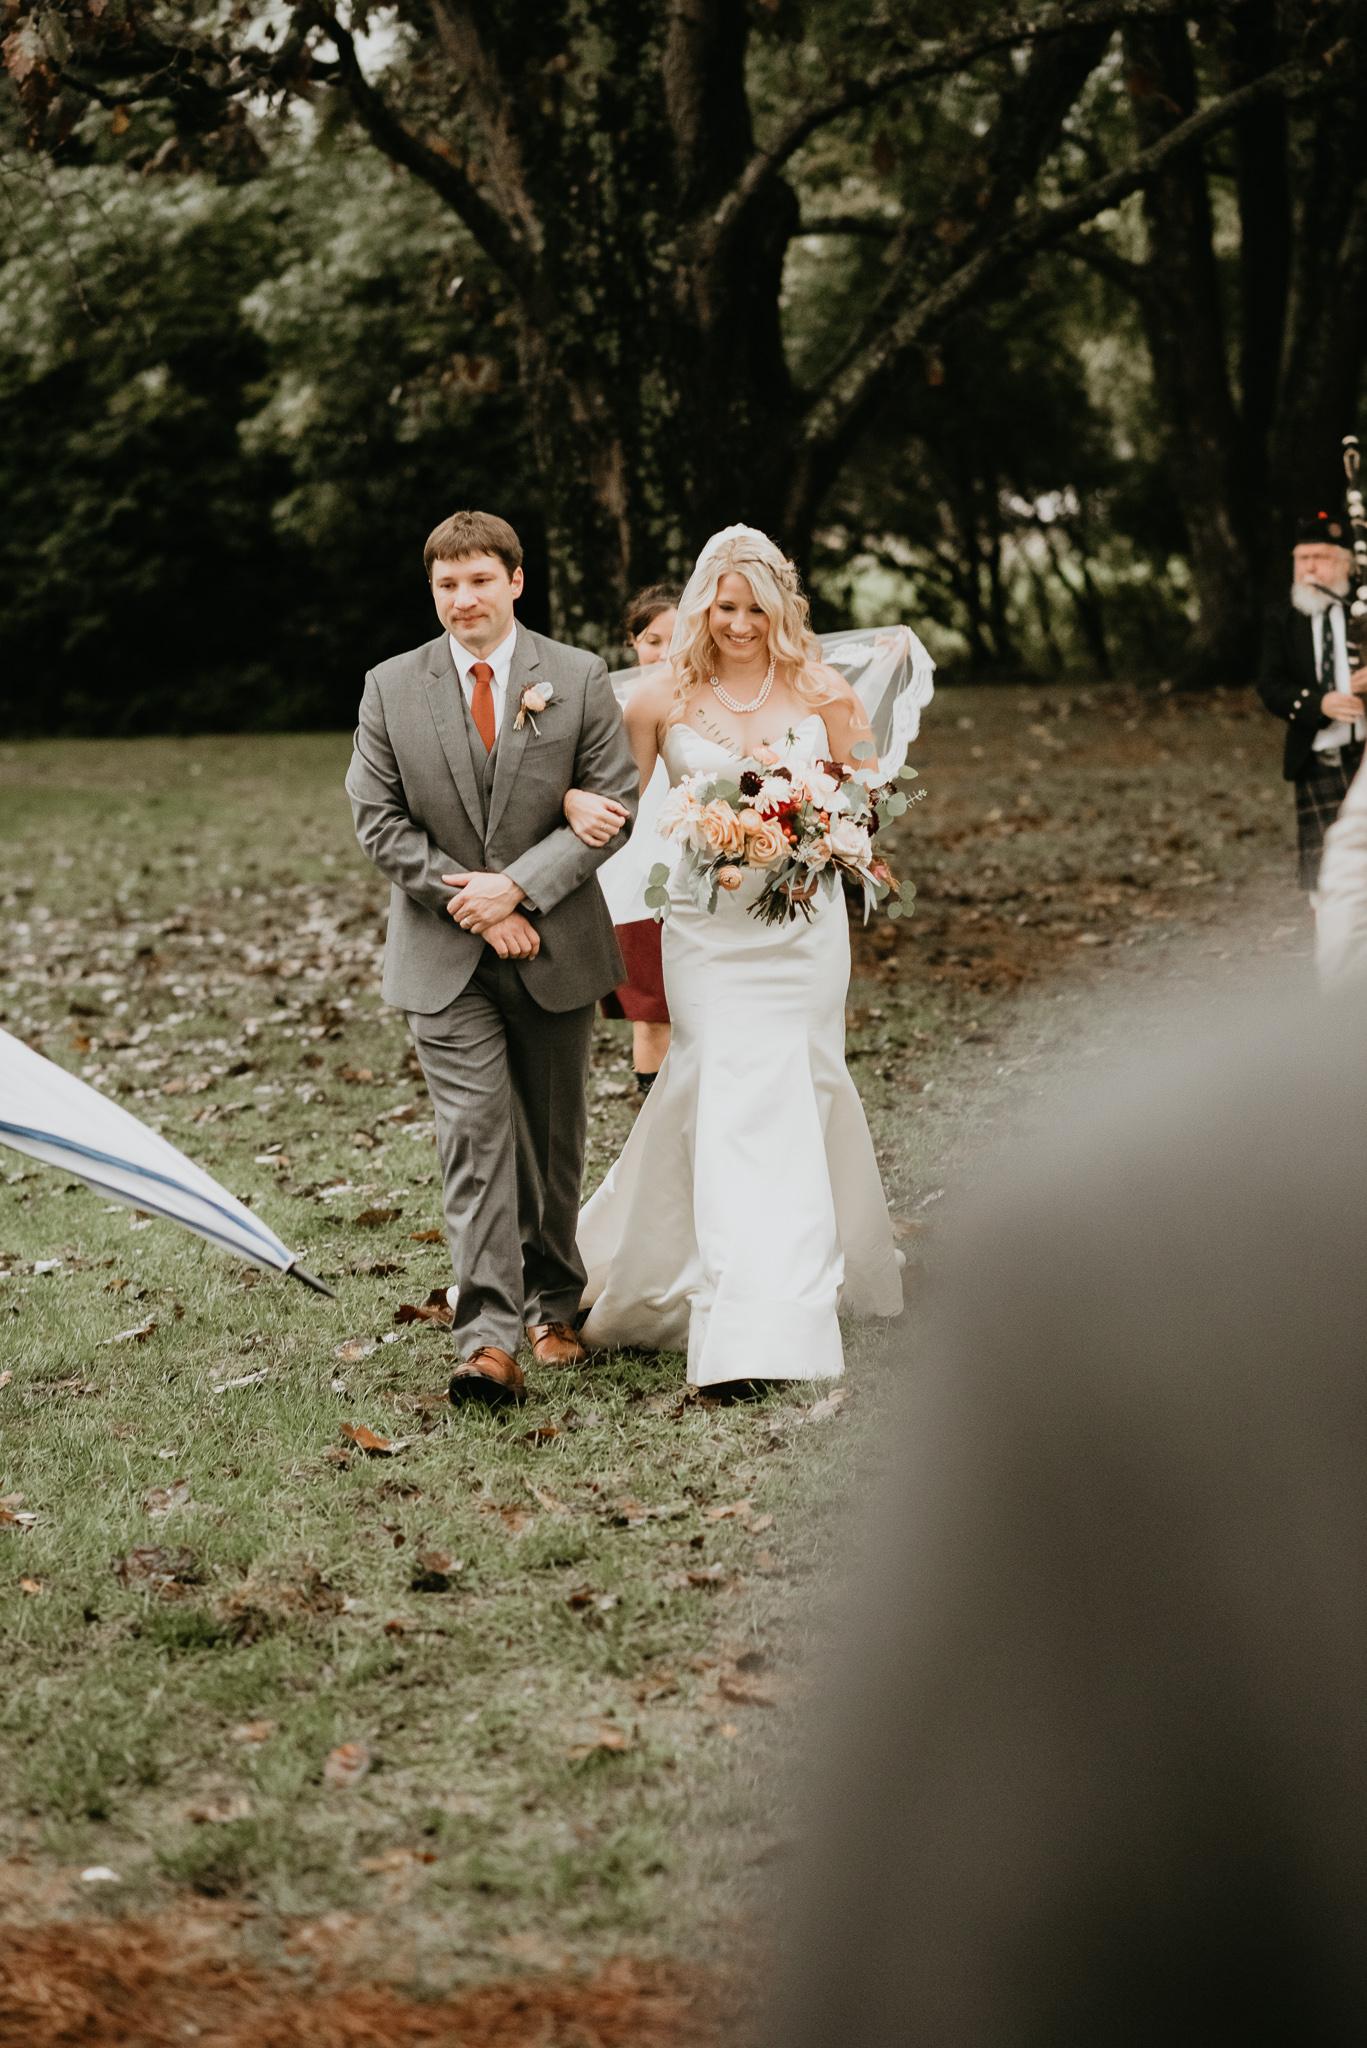 Sundara - Weddings - Virginia - Best Wedding Photographer - Pat Cori Photography-43.jpg